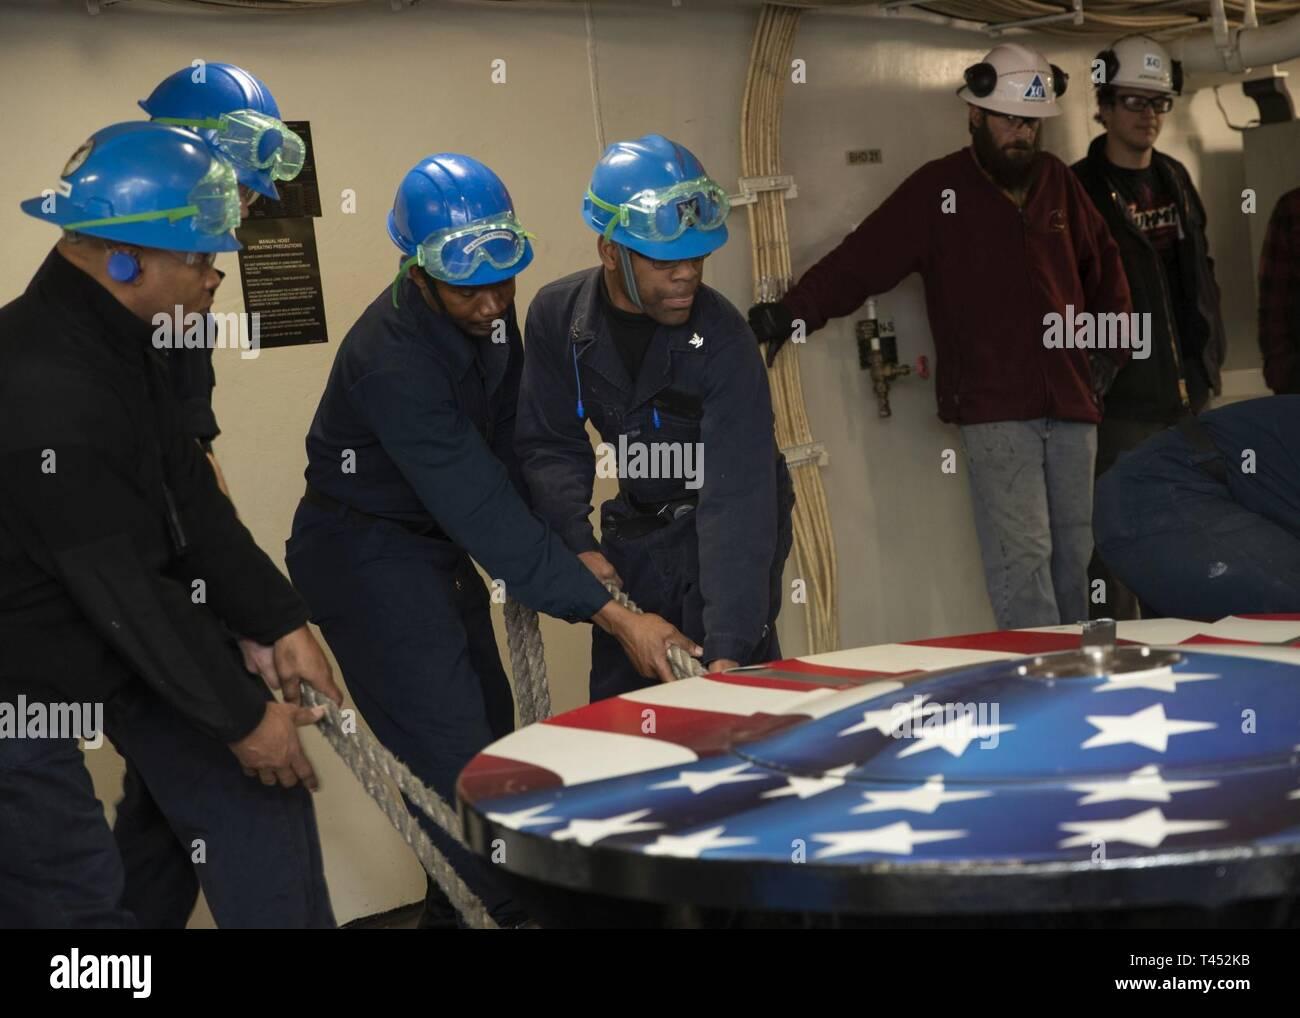 NEWPORT NEWS, Va  (Feb  27, 2019) Sailors assigned to USS